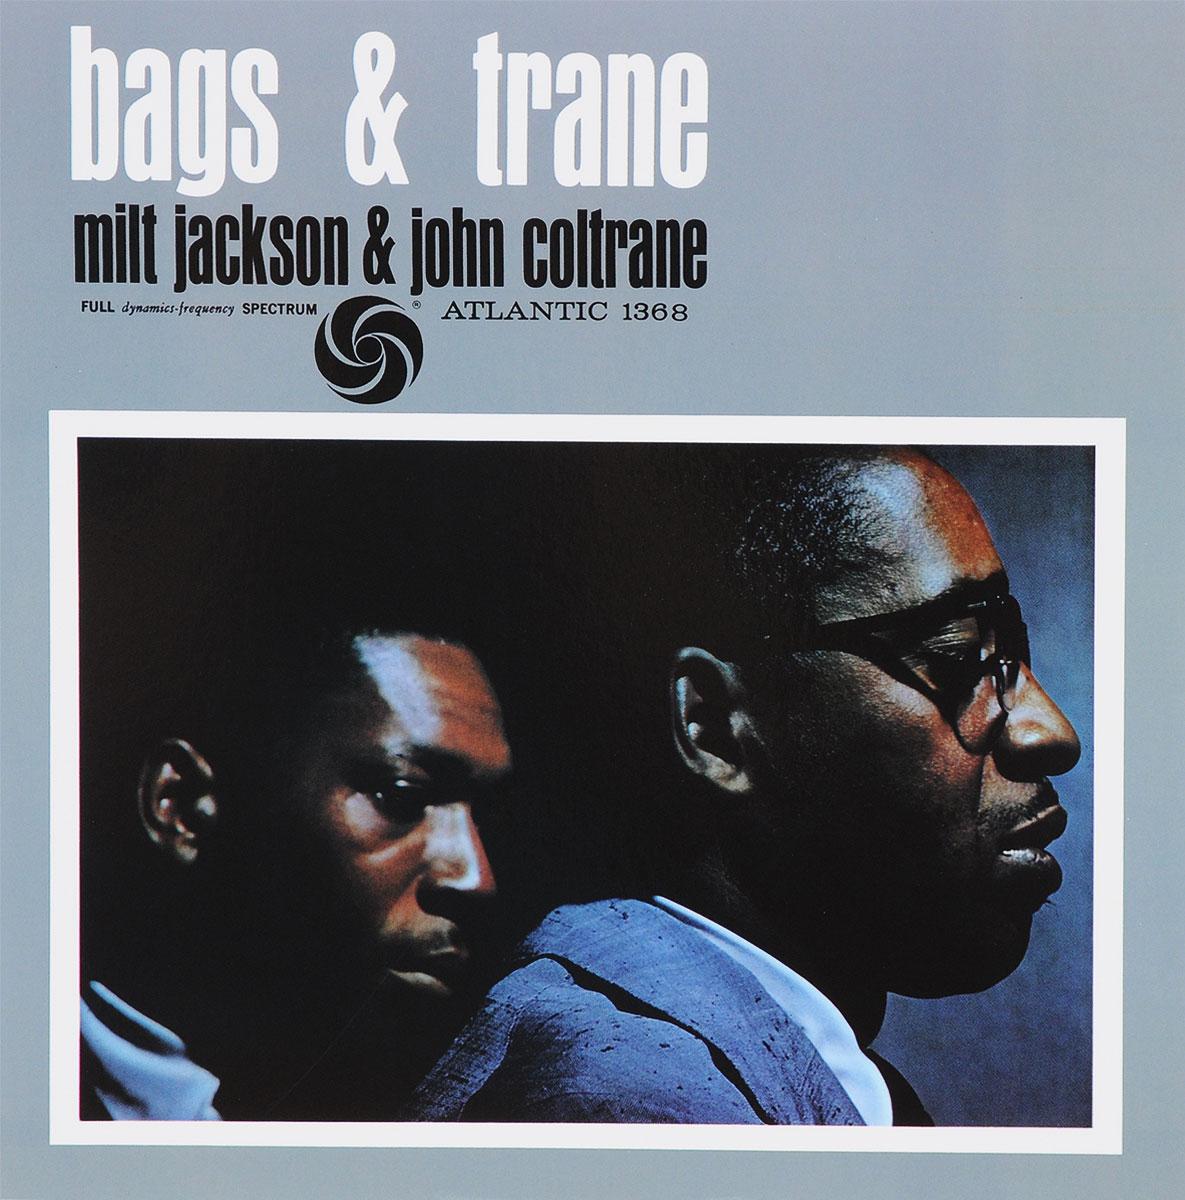 Джон Колтрейн,Милт Джексон John Coltrane, Milt Jackson. Bags & Trane (LP) кэннонболл эдерли милт джексон cannonball adderley with milt jackson things are getting better lp